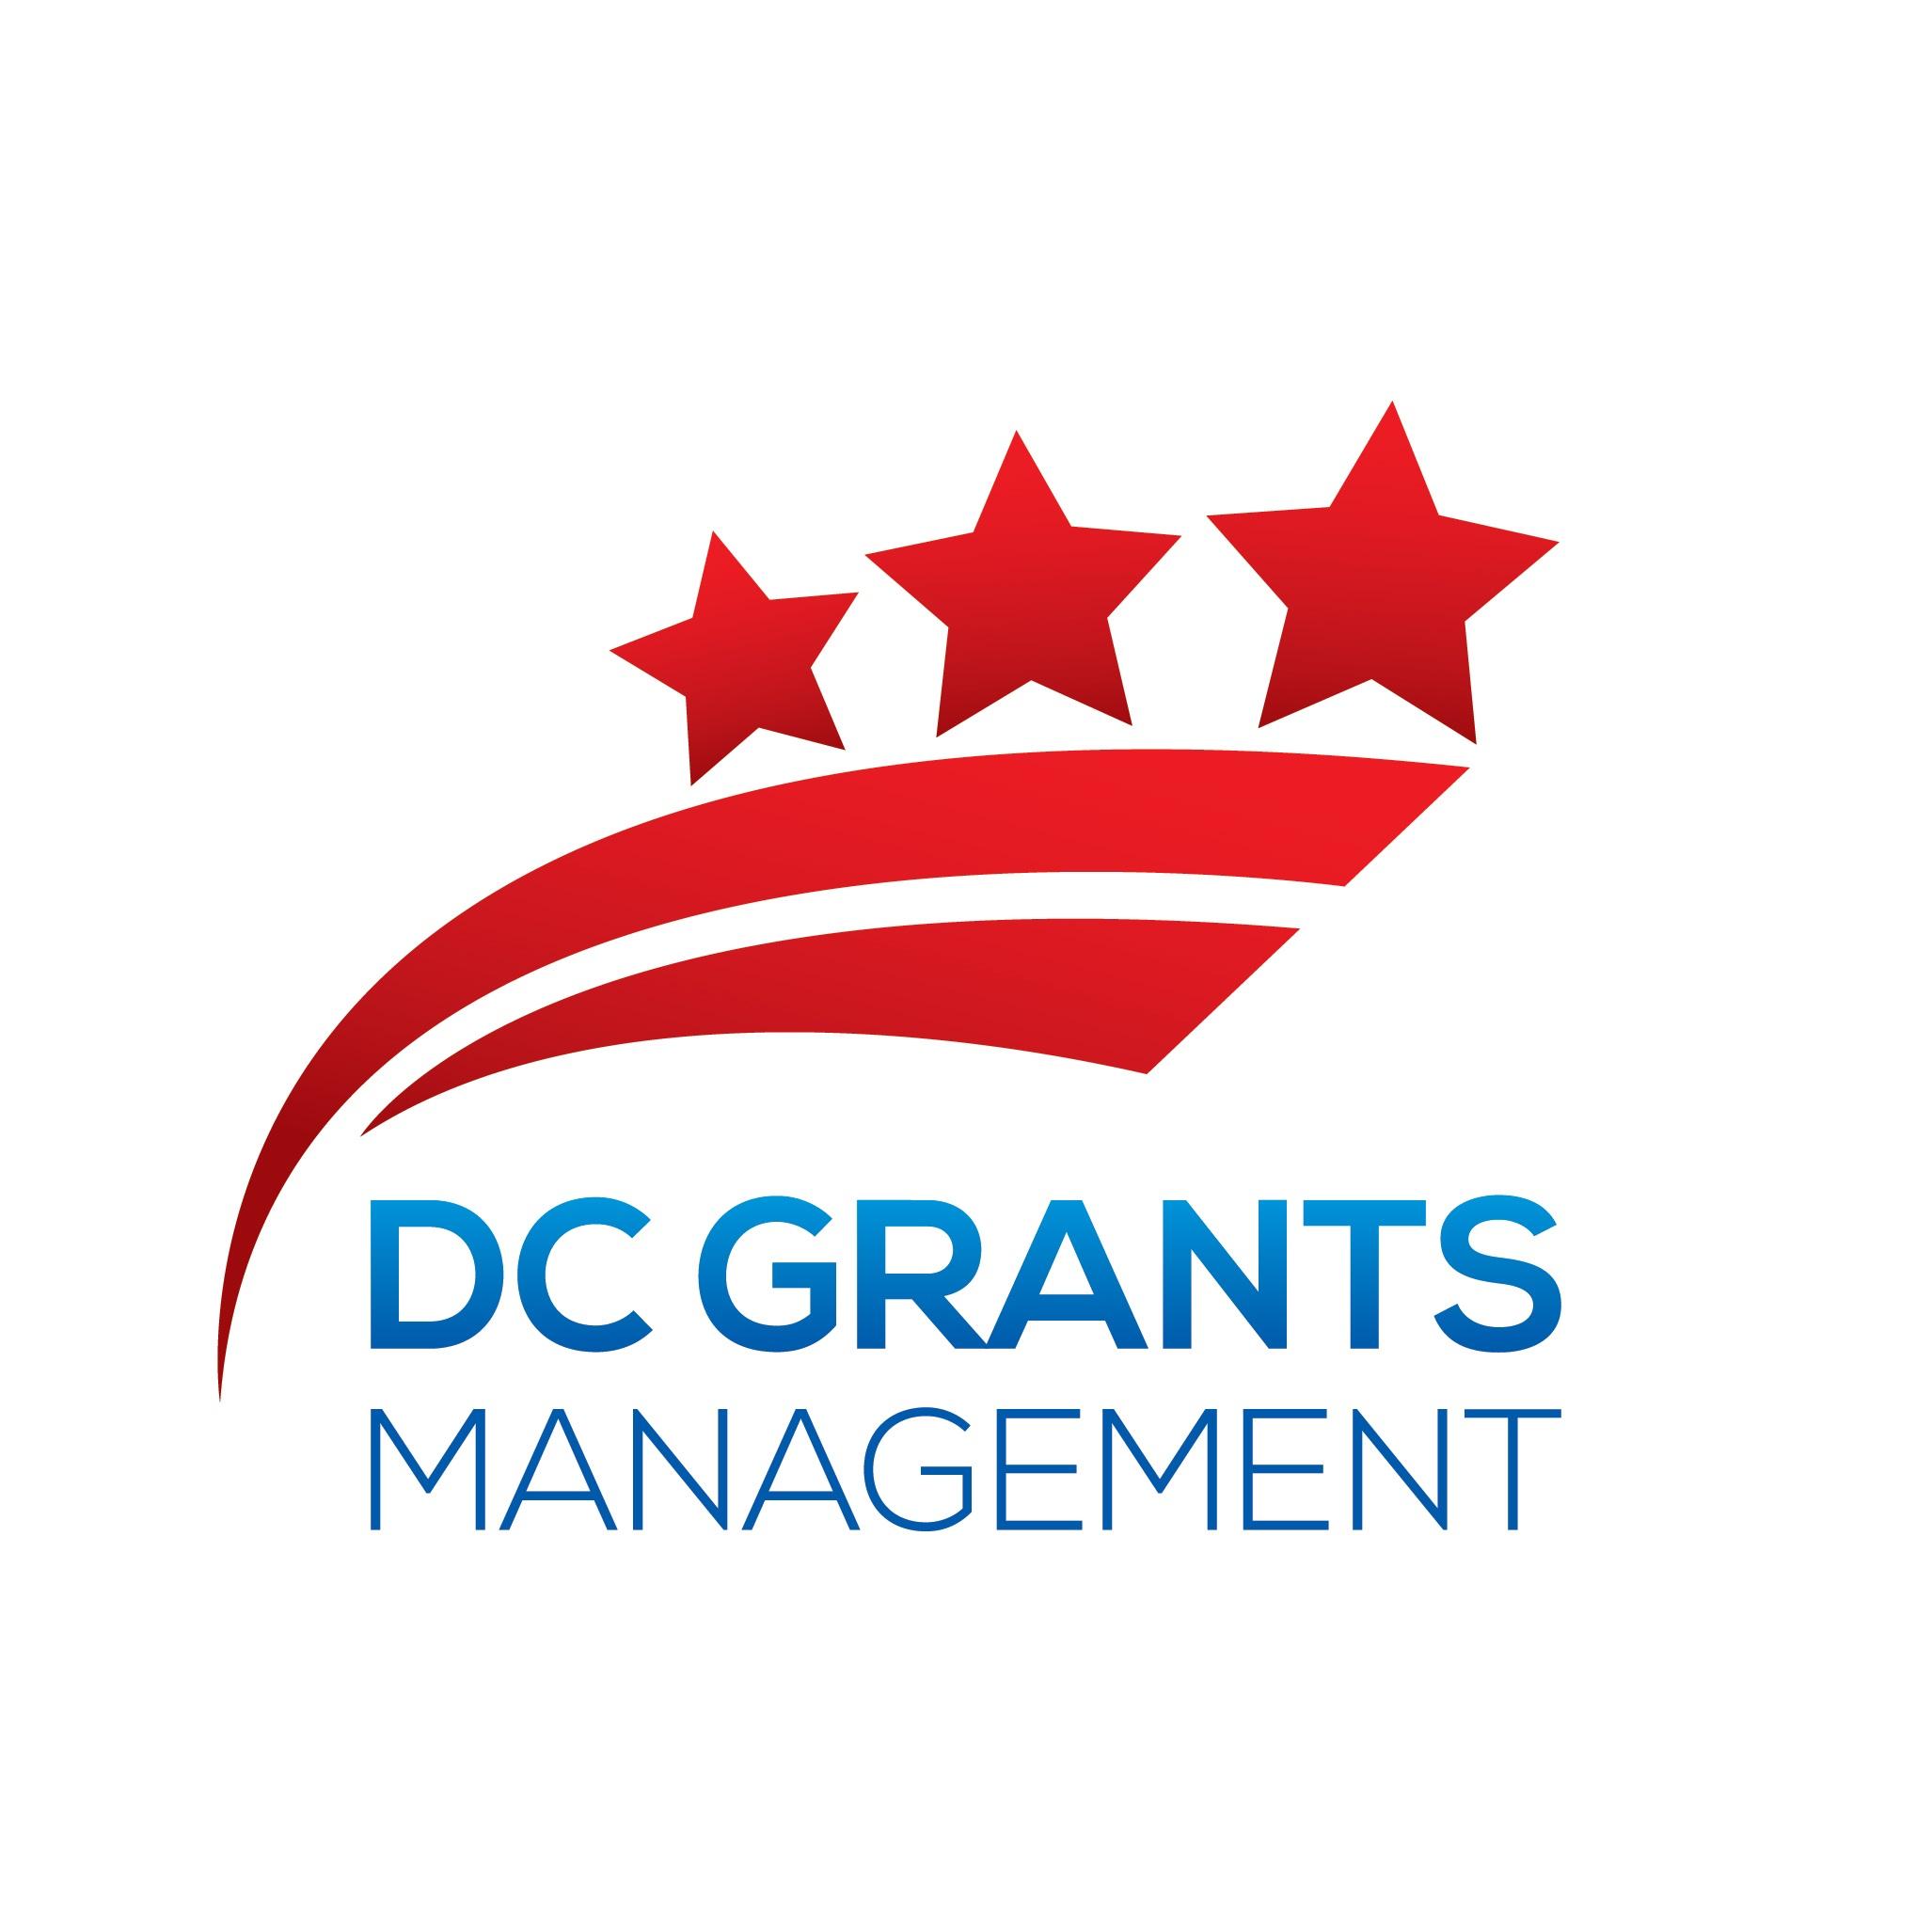 2017 DC Grants Management Conference